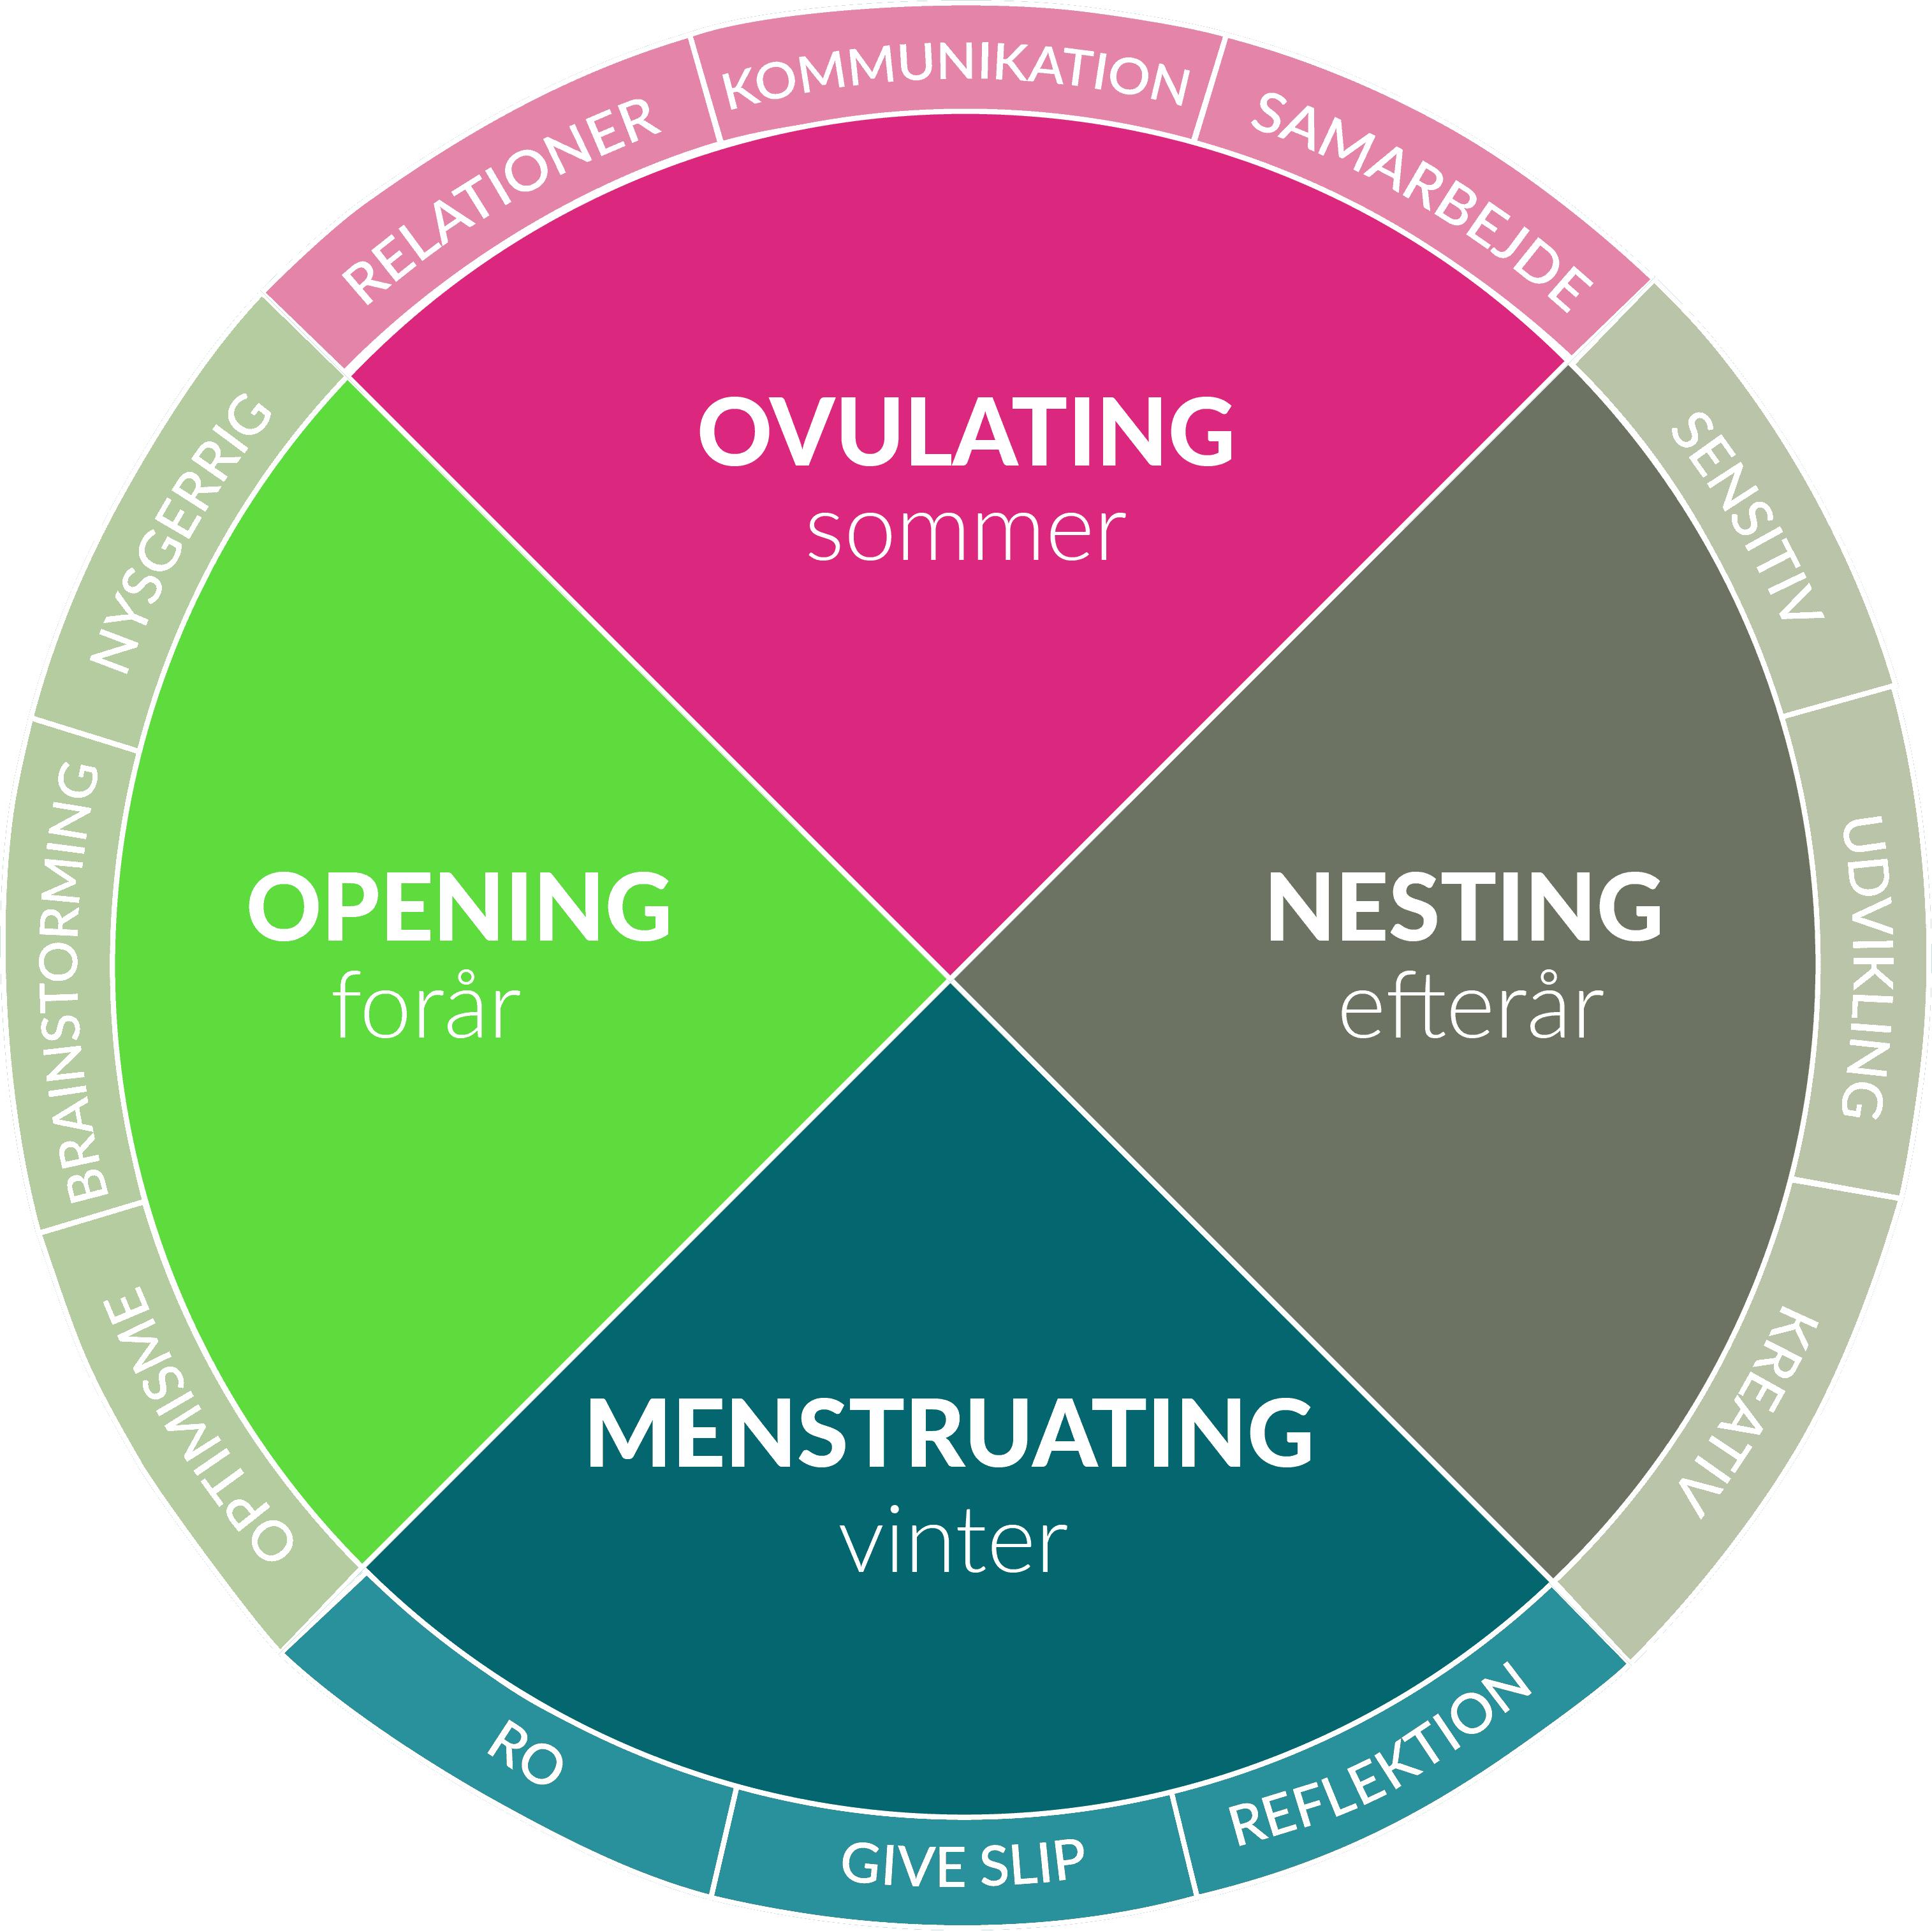 cyklus menstruation